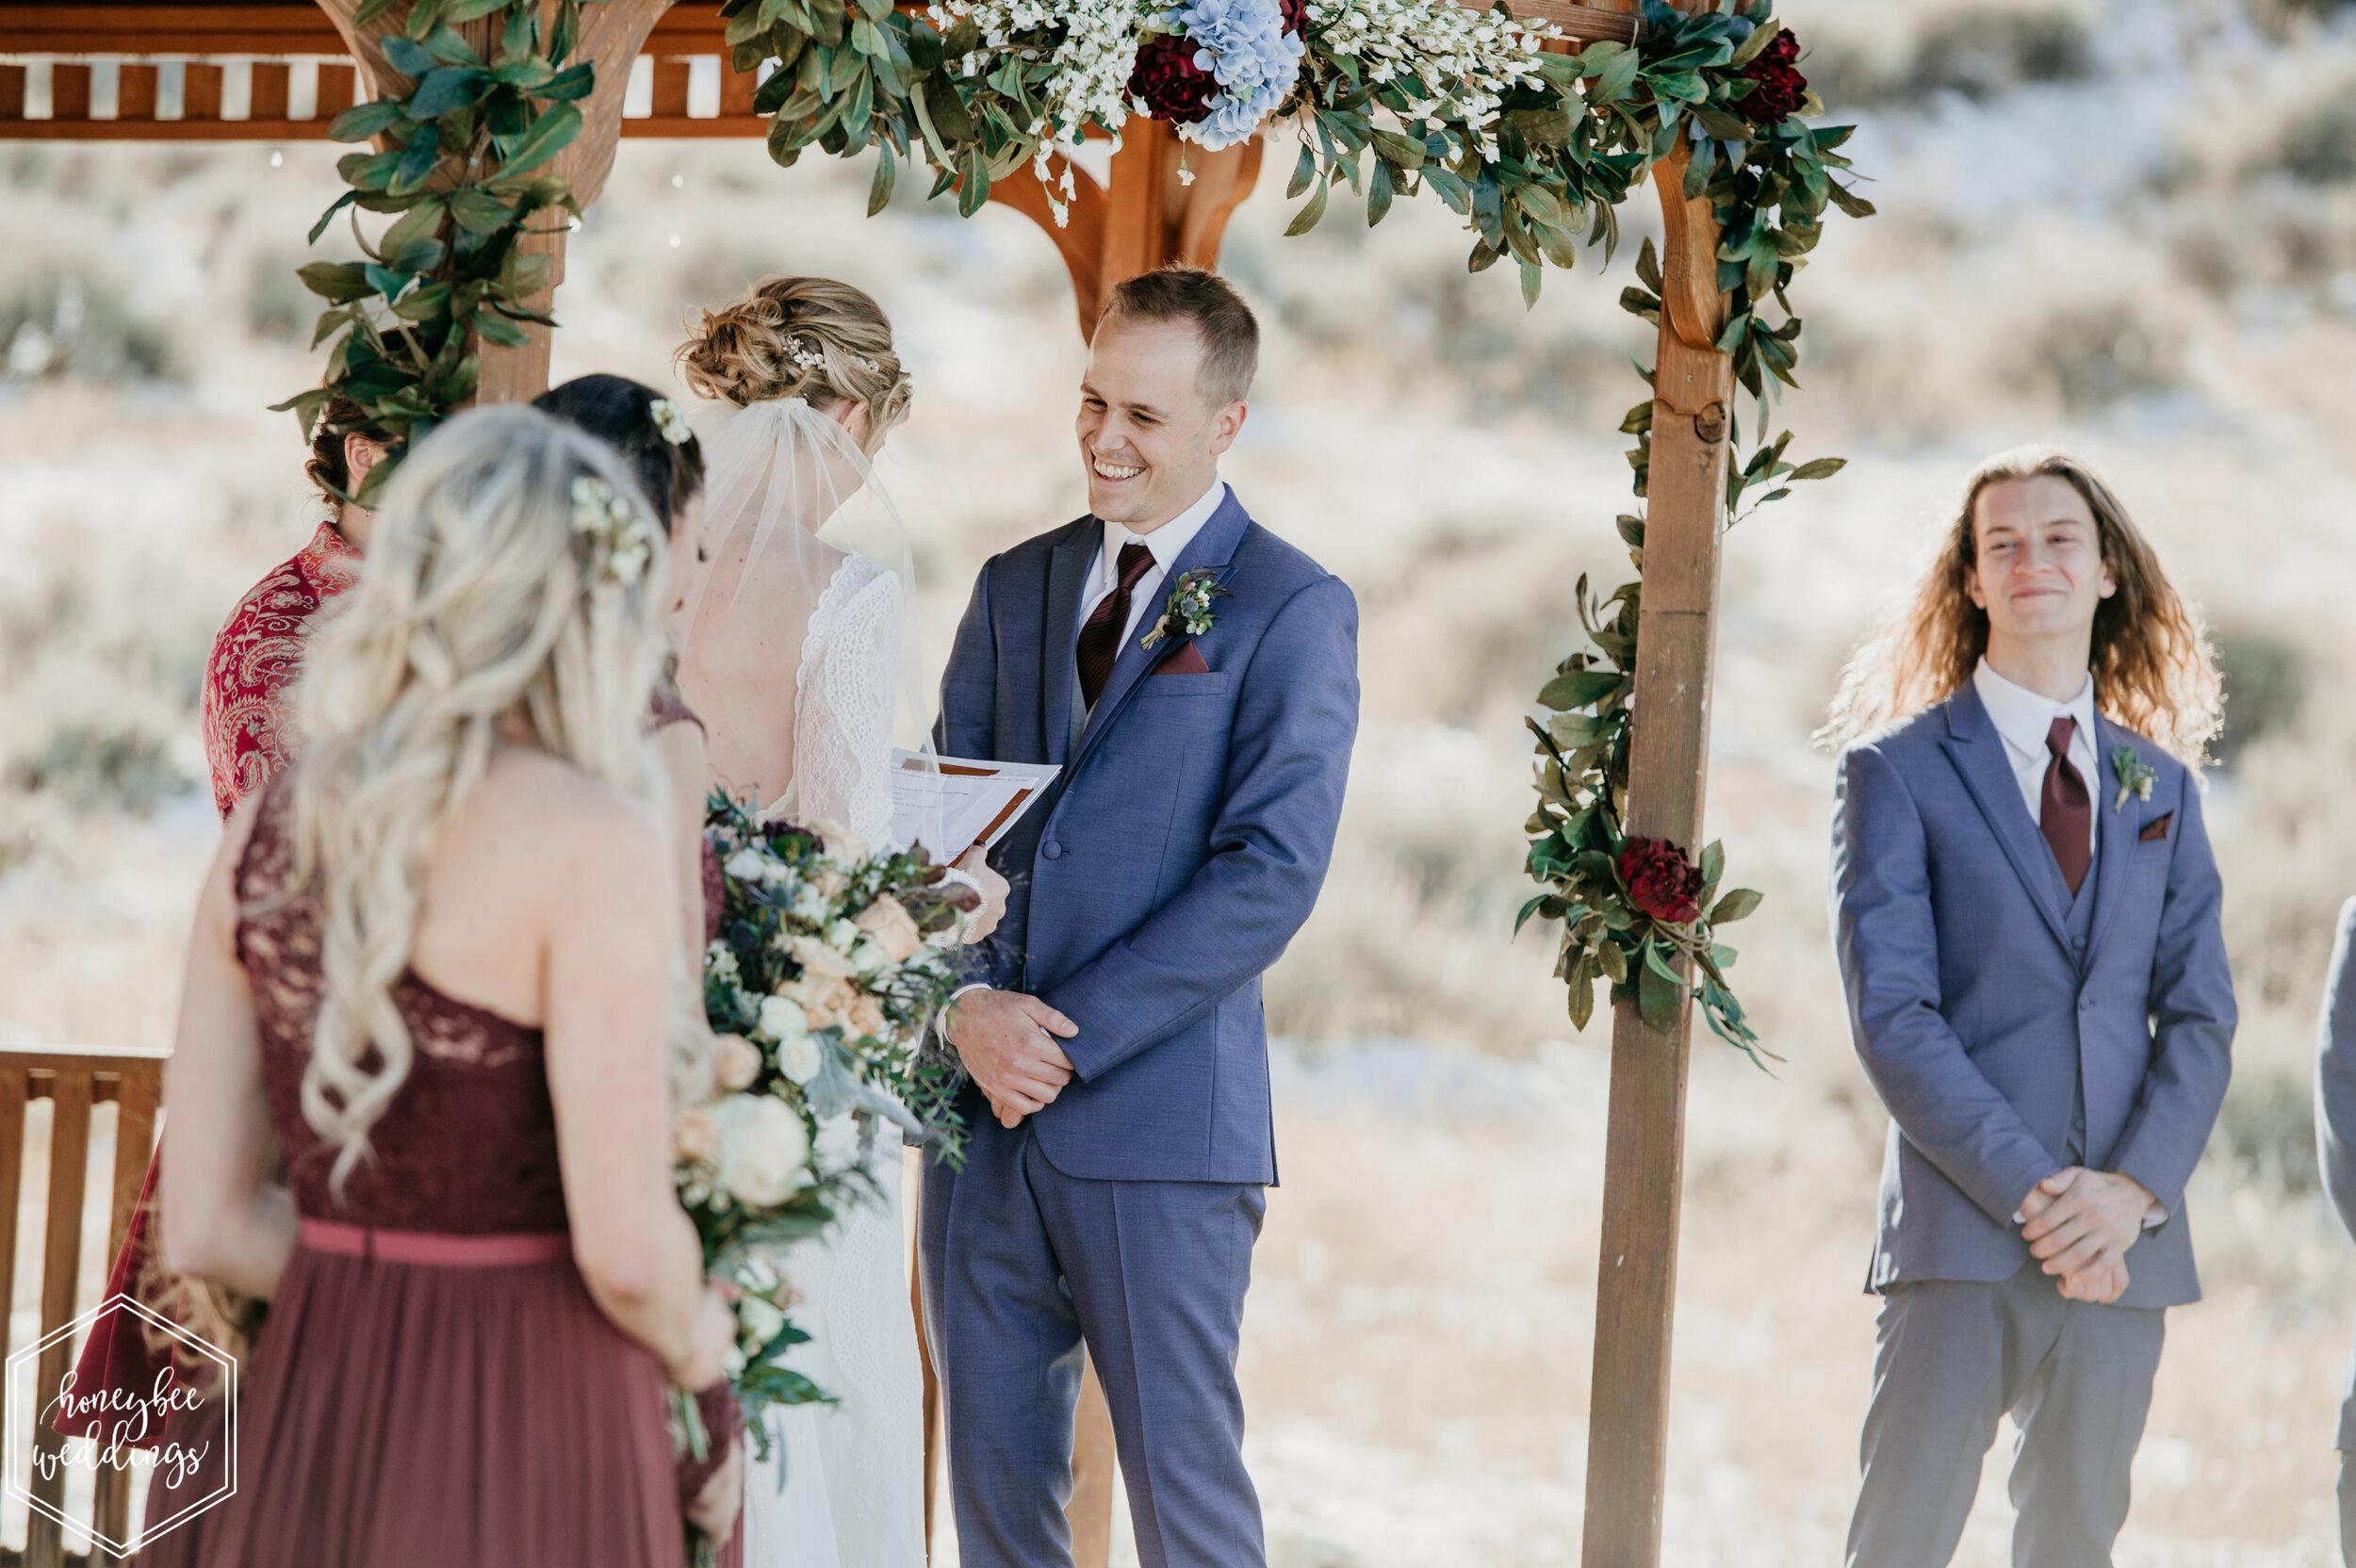 127Chico Hot Springs Wedding_Montana Wedding Photographer_Winter Wedding_Ariel & Richard_October 12, 2019-2303.jpg